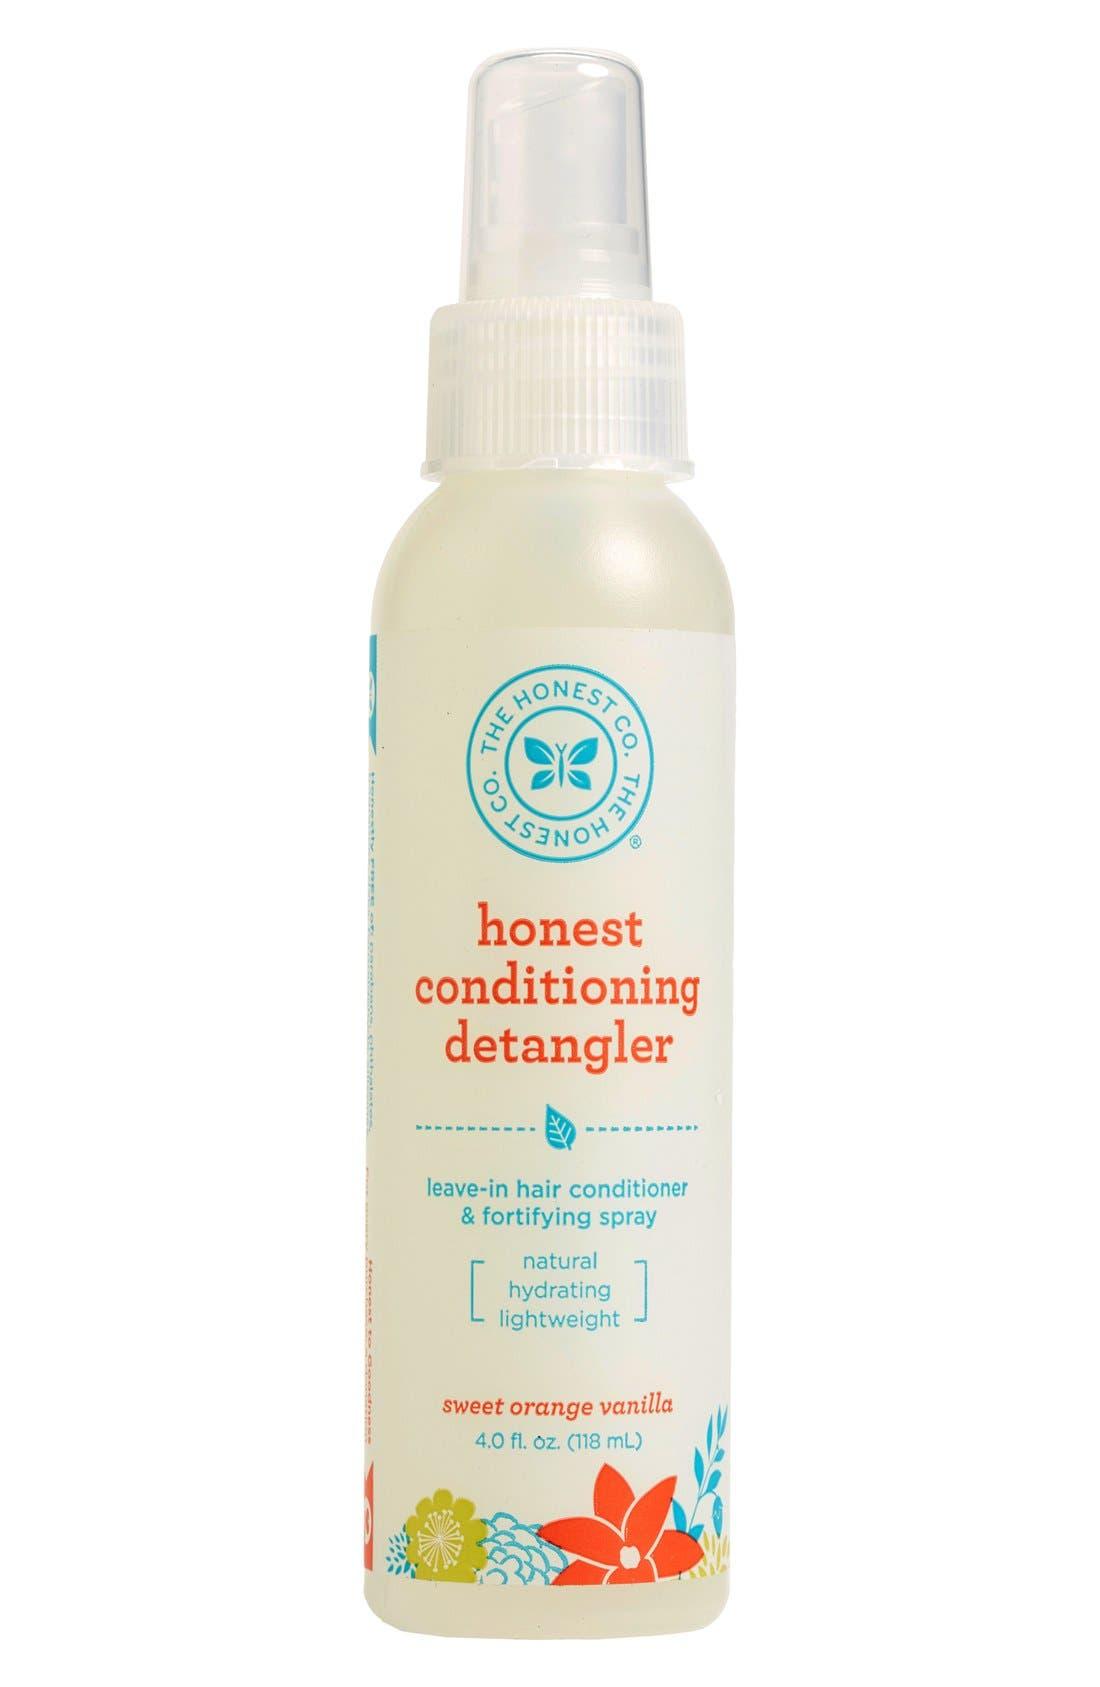 Leave-in Conditioning Detangler Spray,                             Main thumbnail 1, color,                             SWEET ORANGE VANILLA